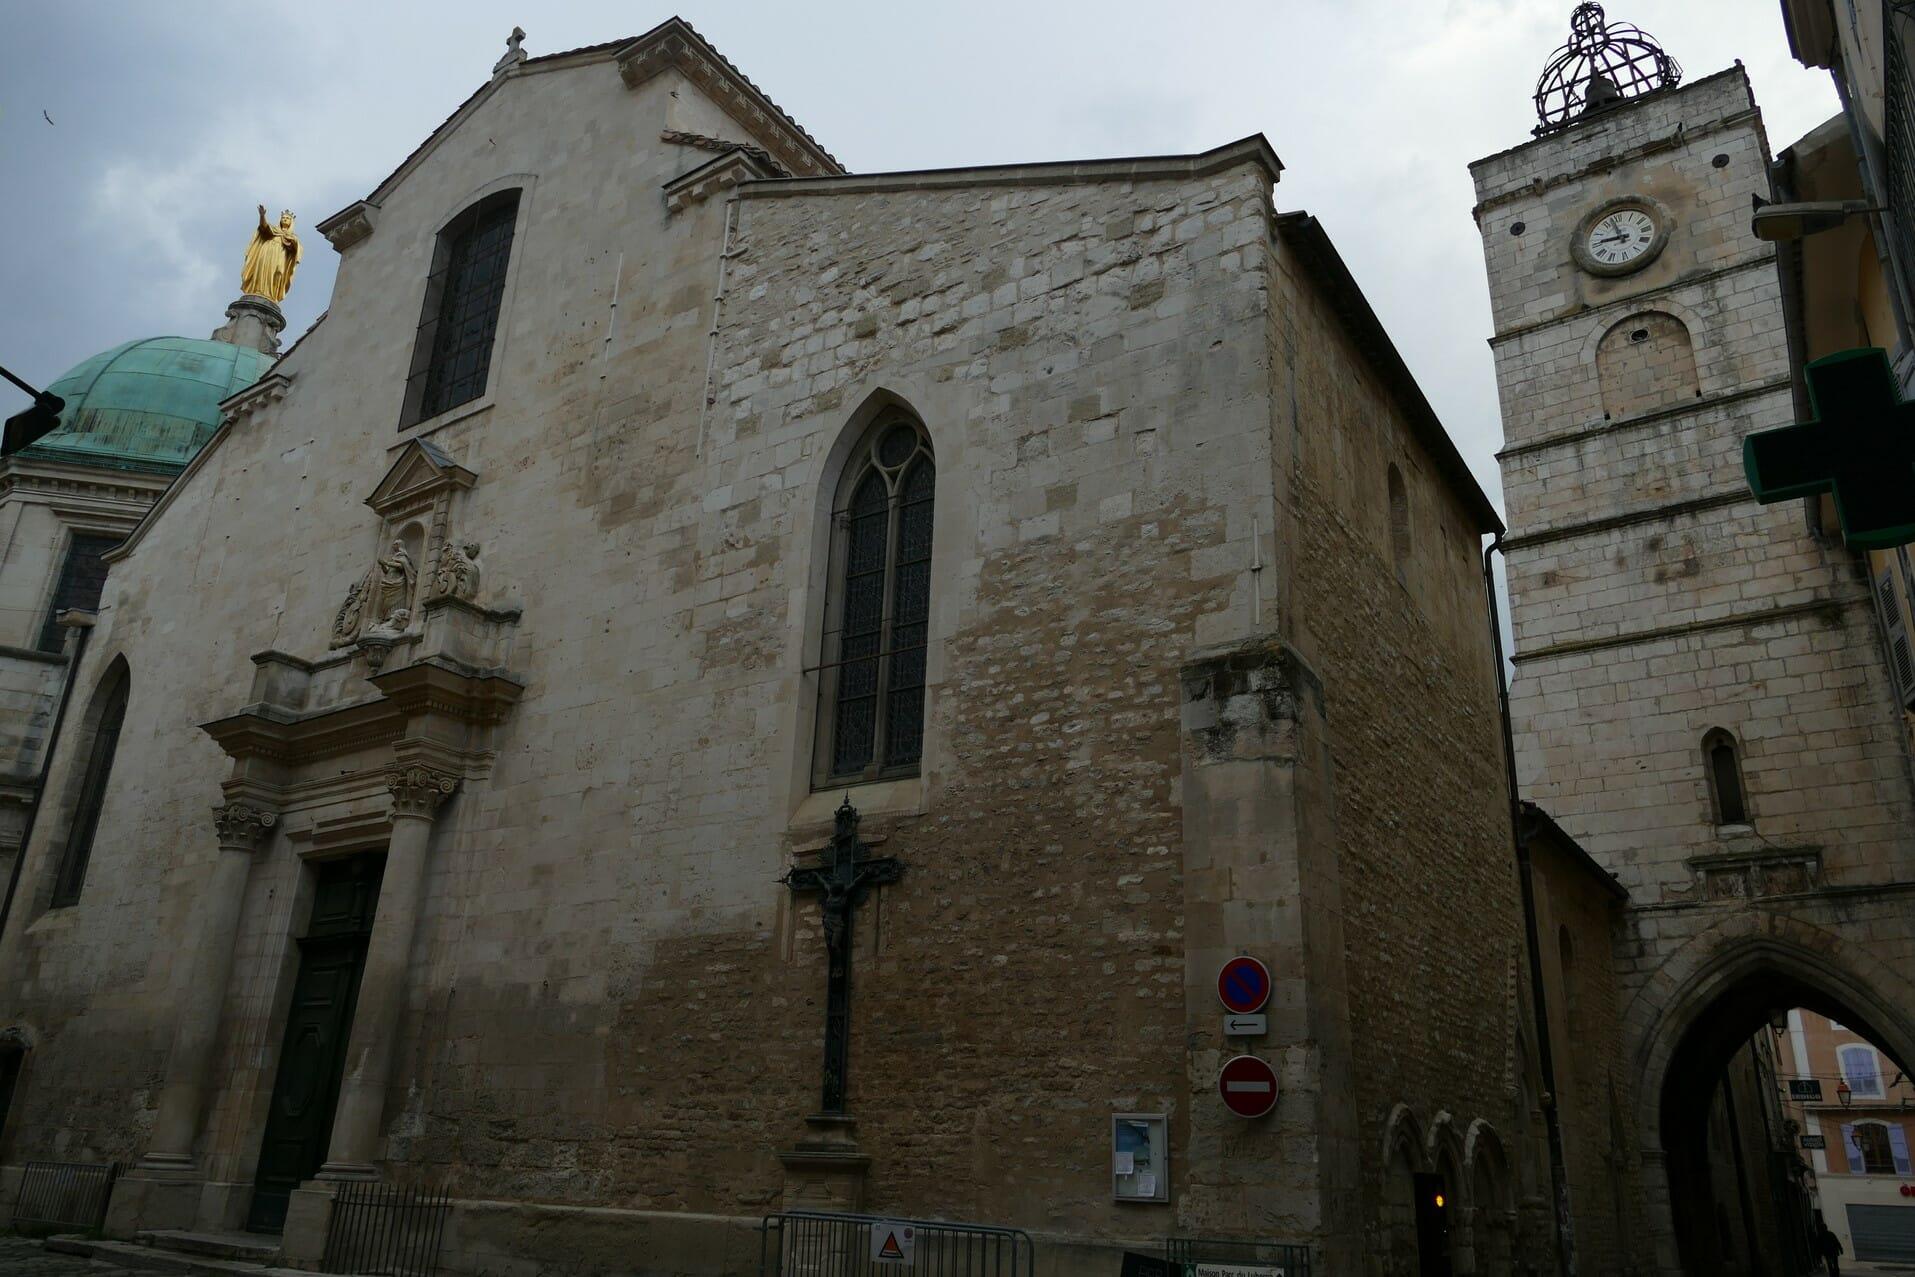 Apt, cathédrale Sainte Anne